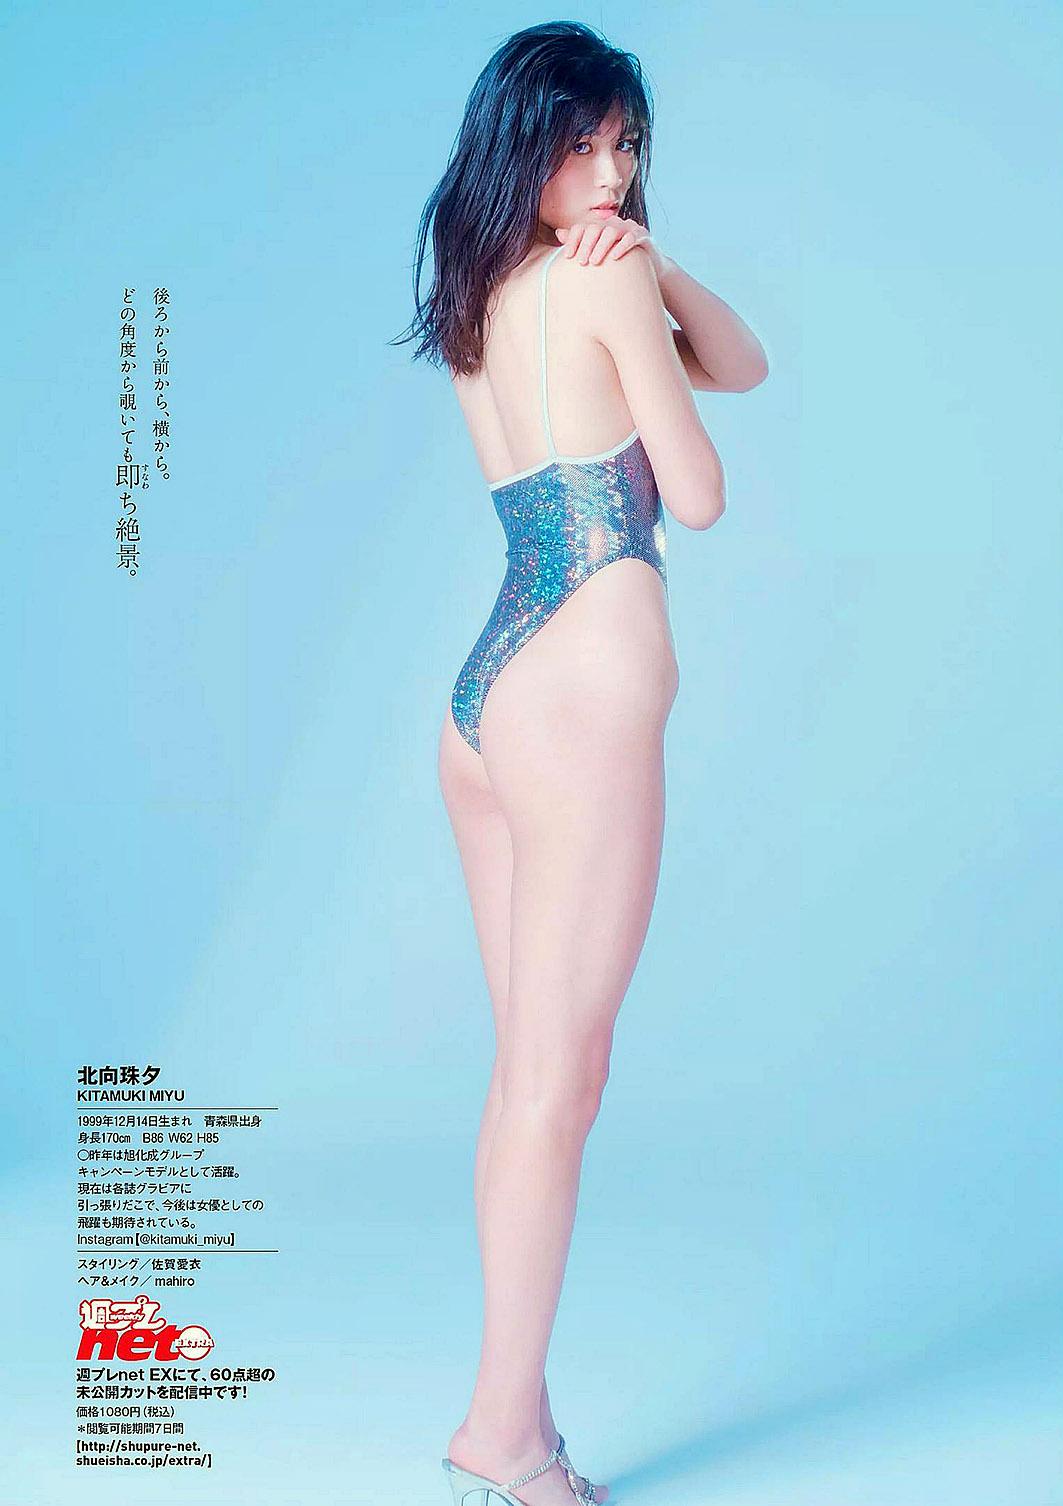 Miyu Kitamuki WPB 190408 by Ryo Kawanishi 04.jpg